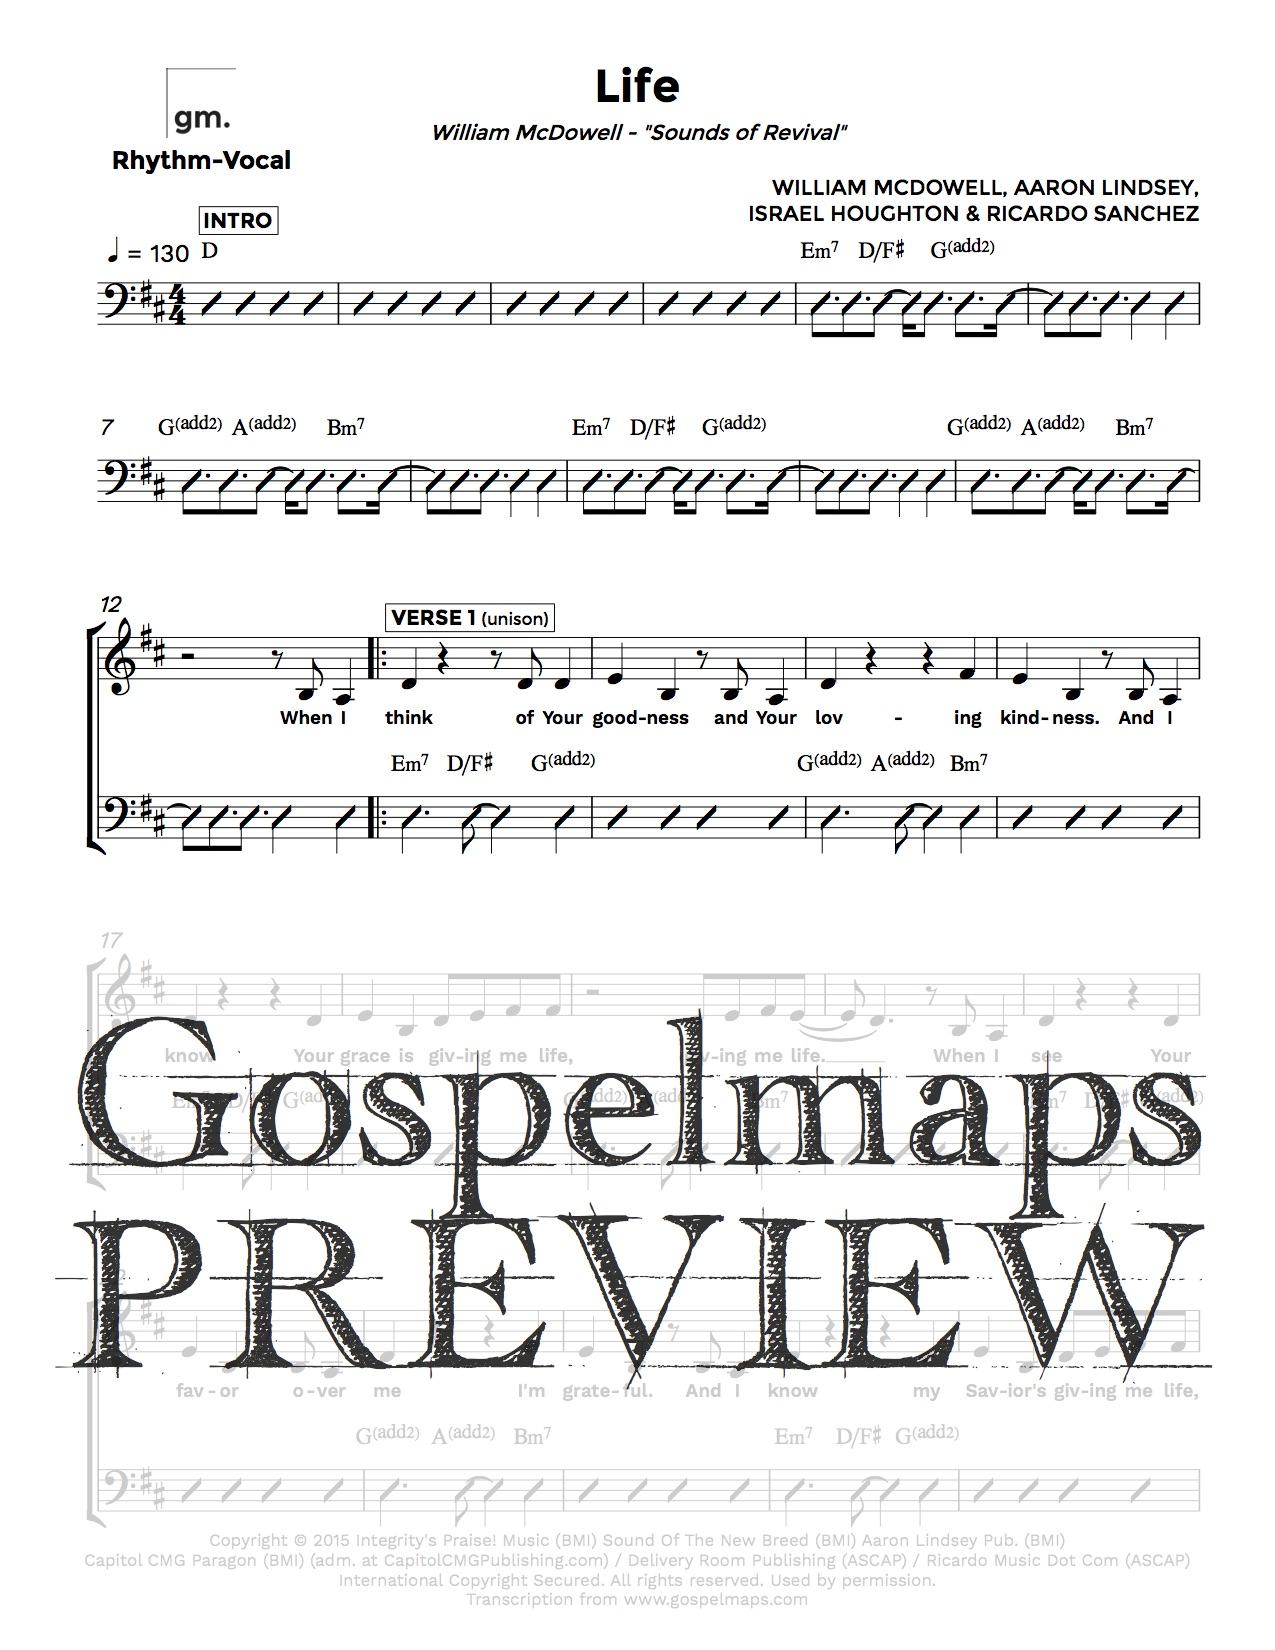 Gospelmaps Life William Mcdowell Rhythm Vocal And Chord